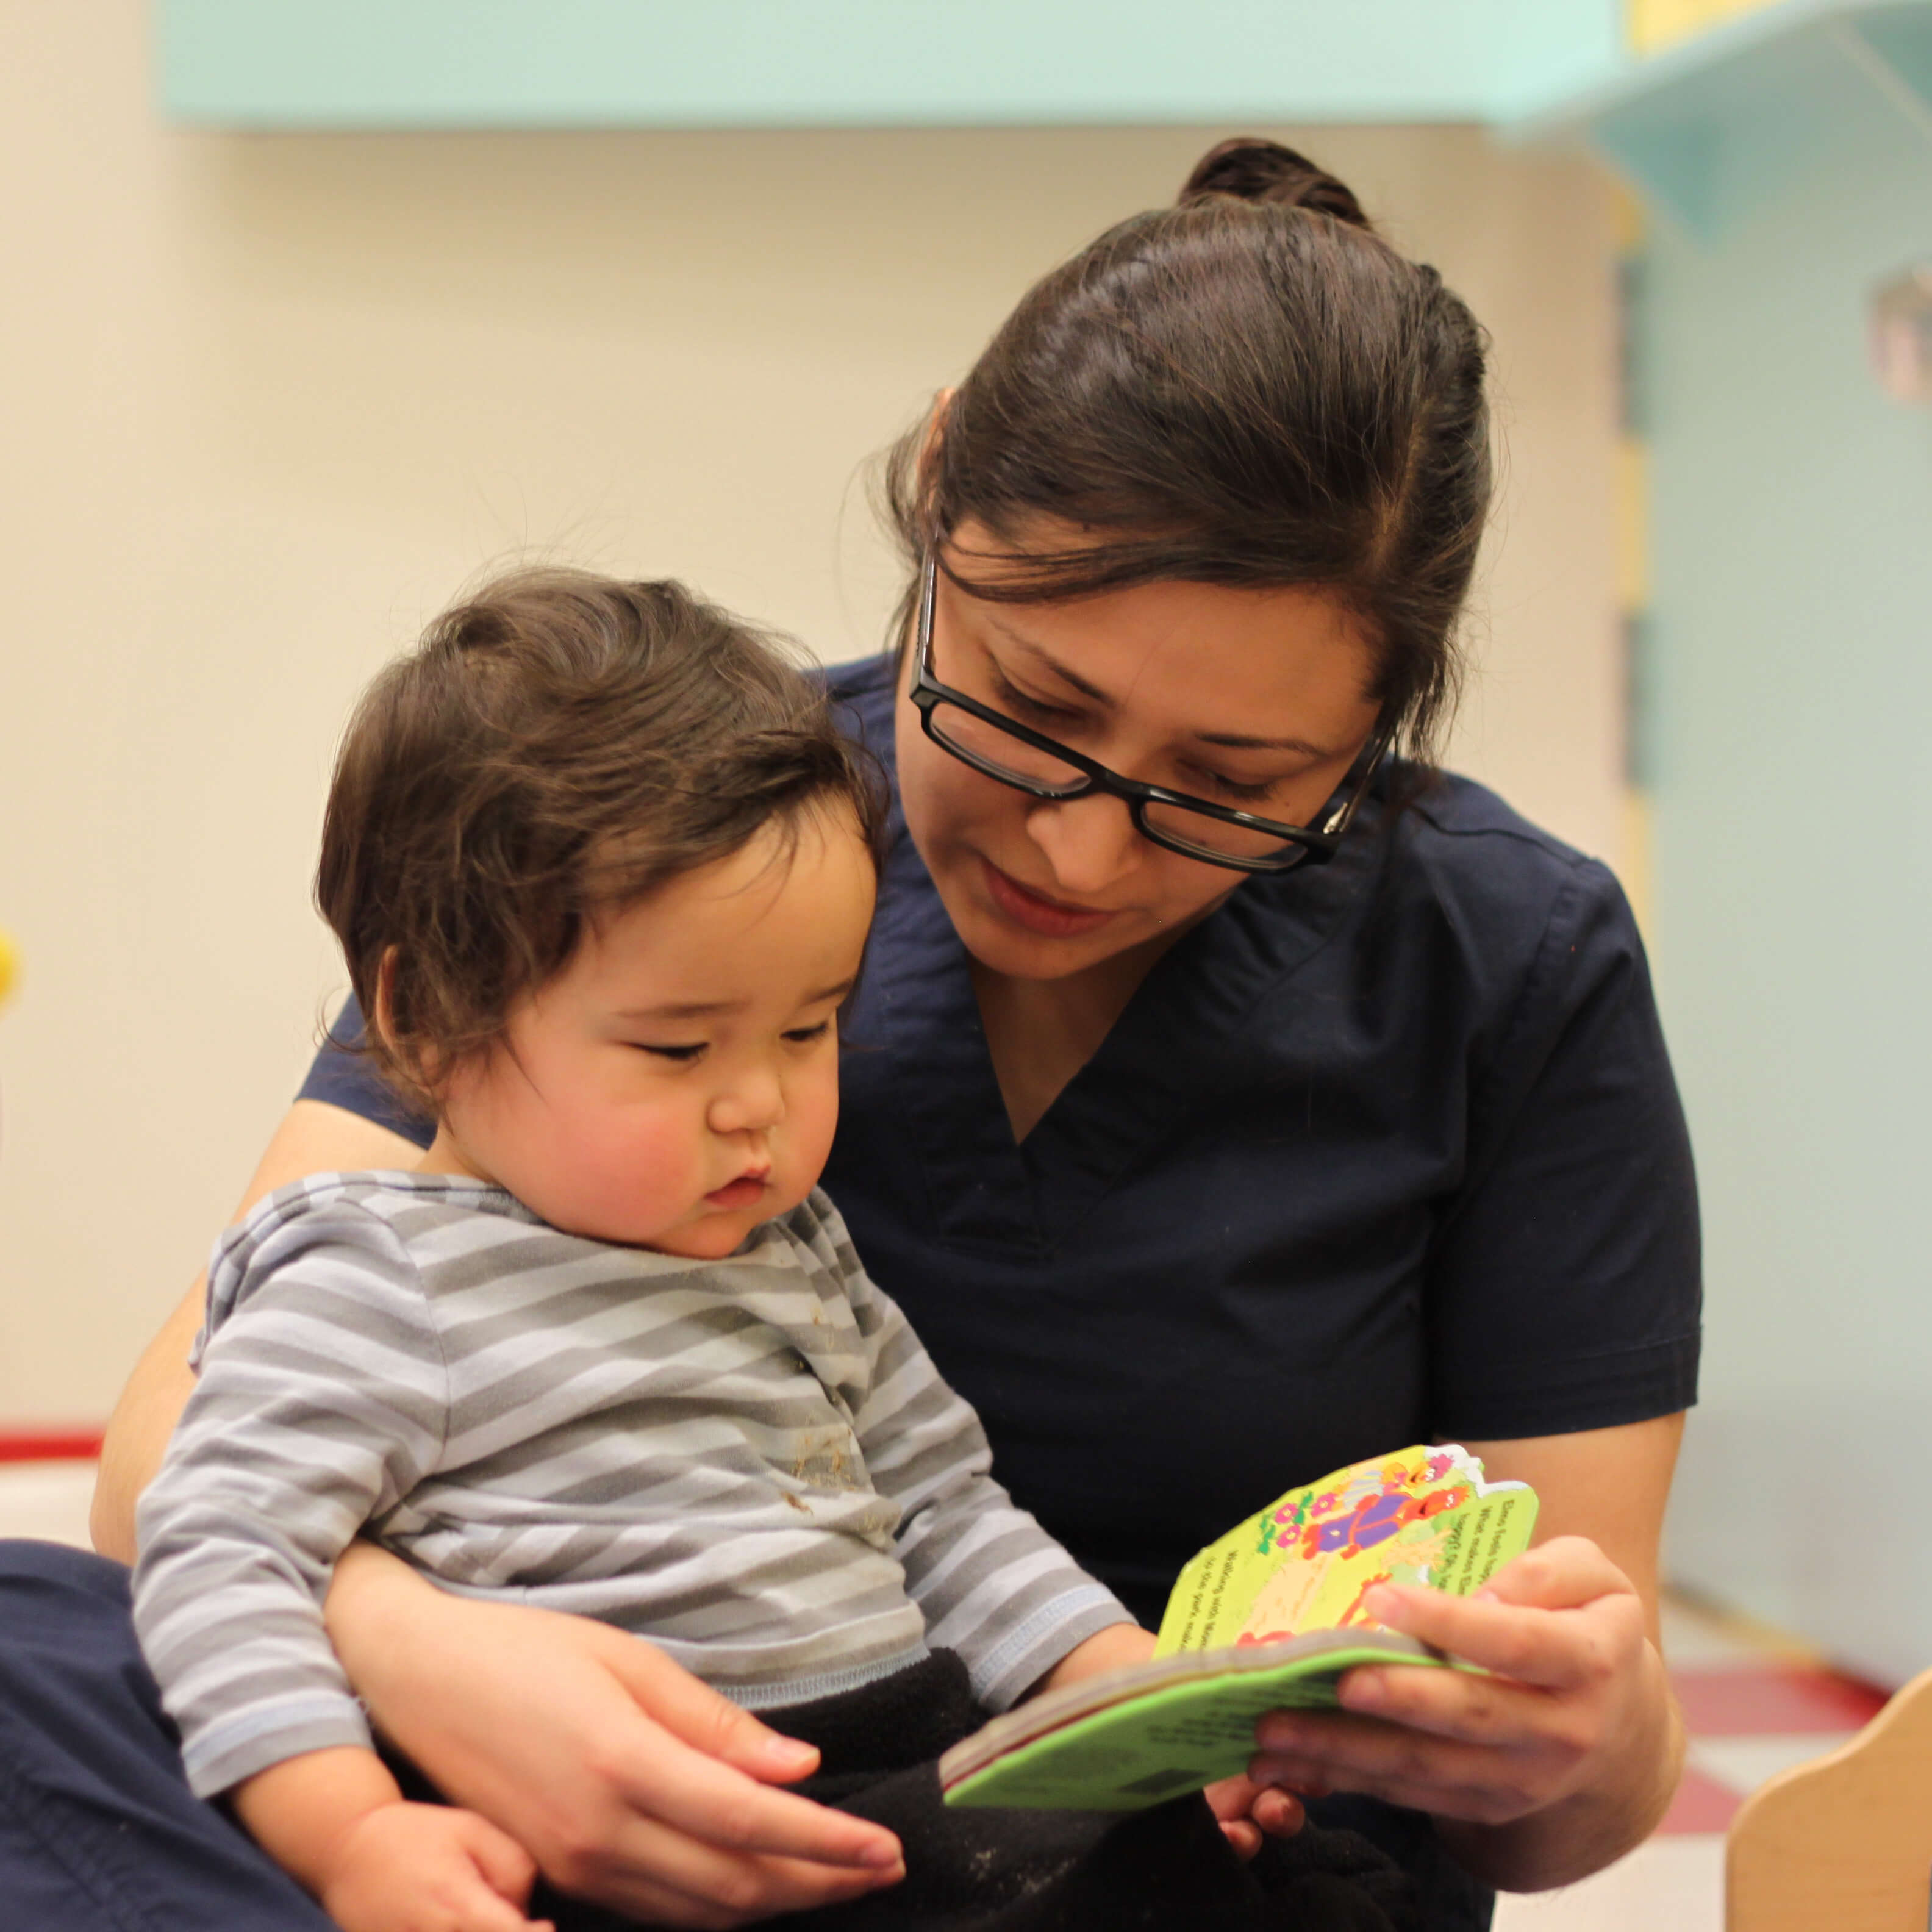 childcare educator with child reading preschool book